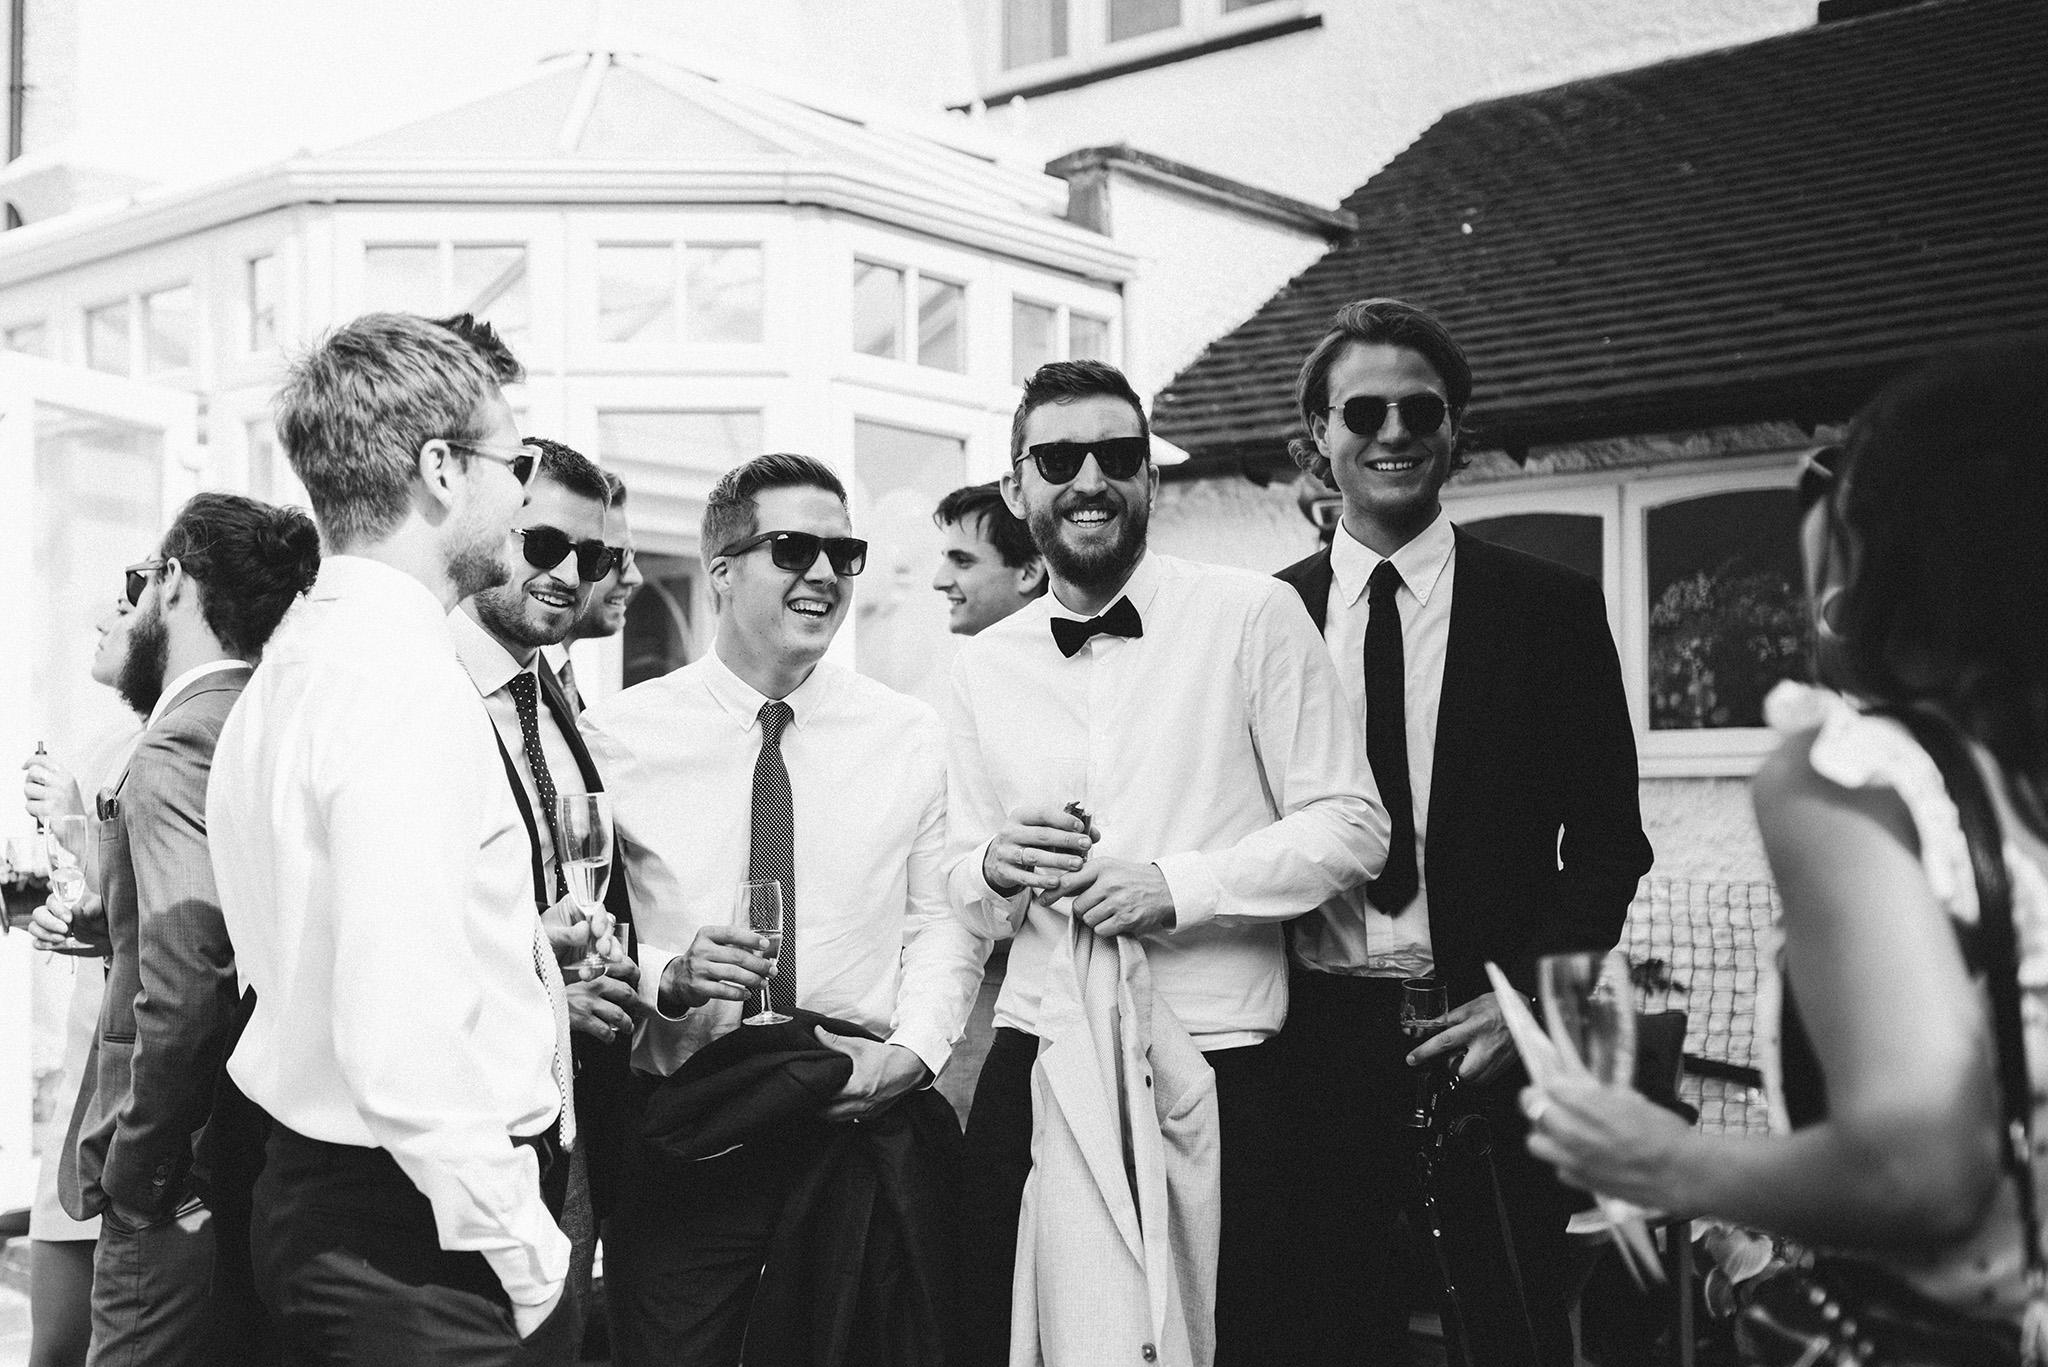 scott-stockwell-photography-wedding-38.jpg